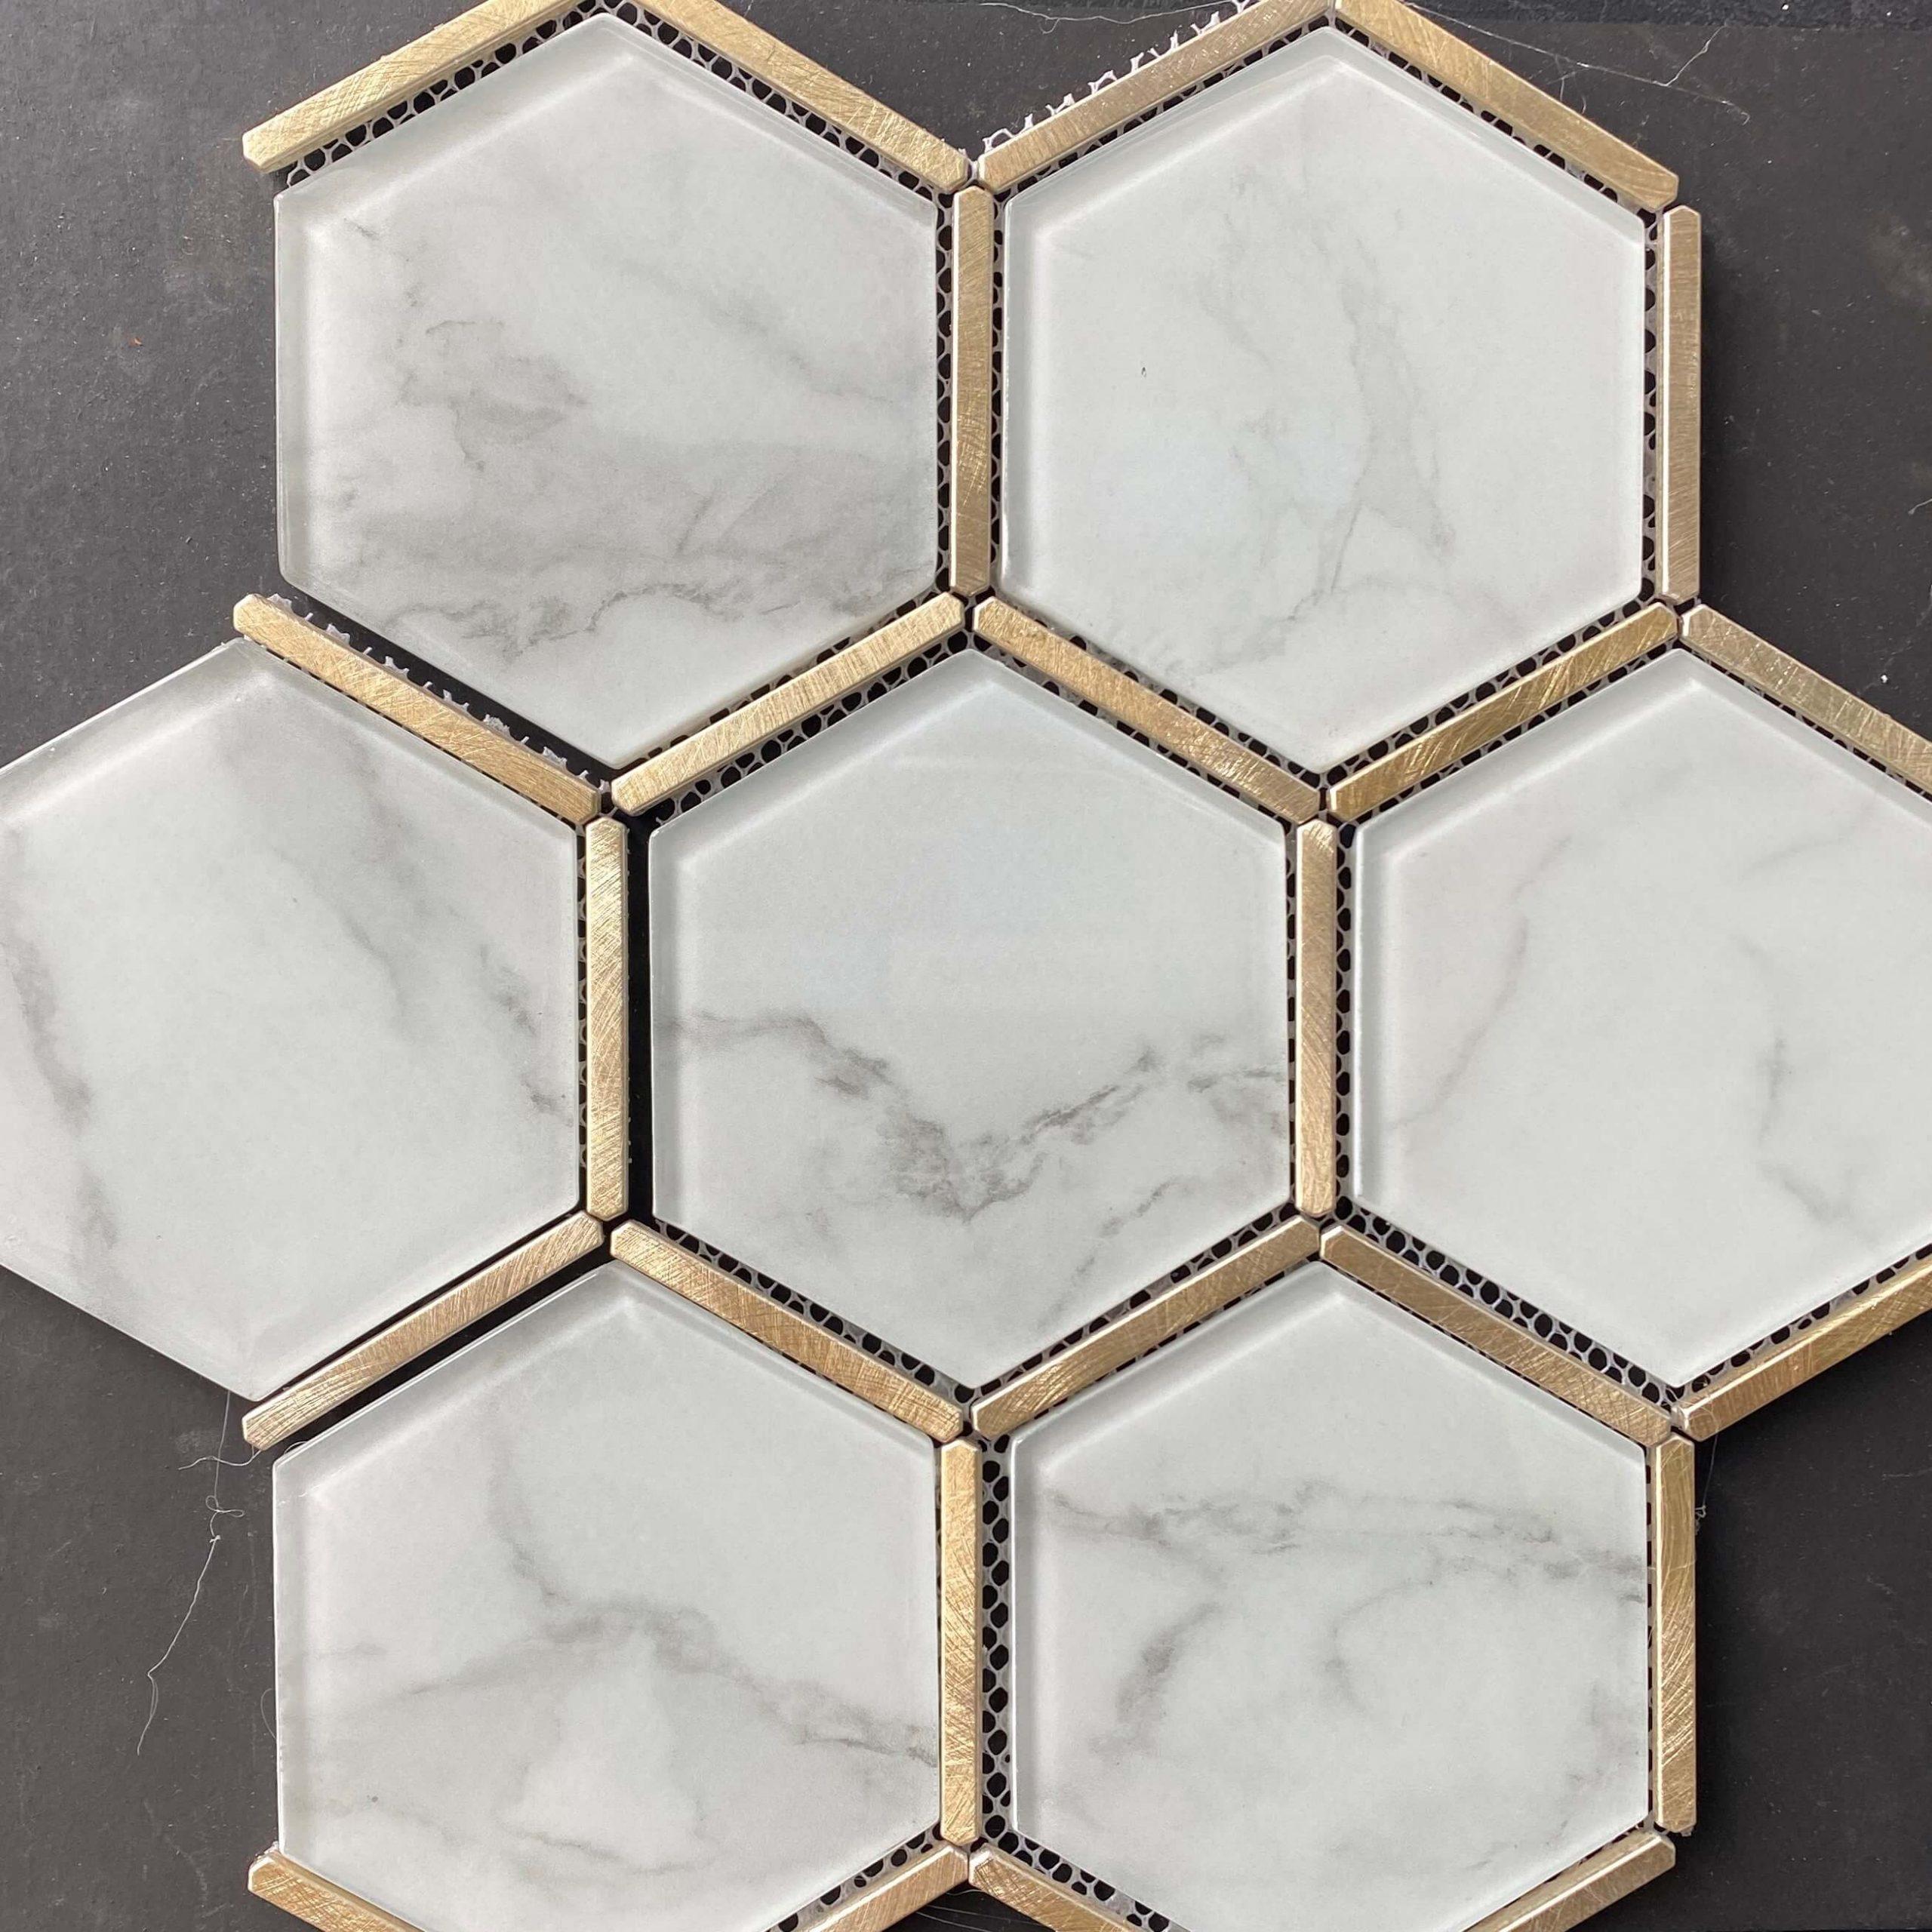 Carrara Look Hexagon Glass Mosaic with Gold Aluminium Trims 222x382mm 7940